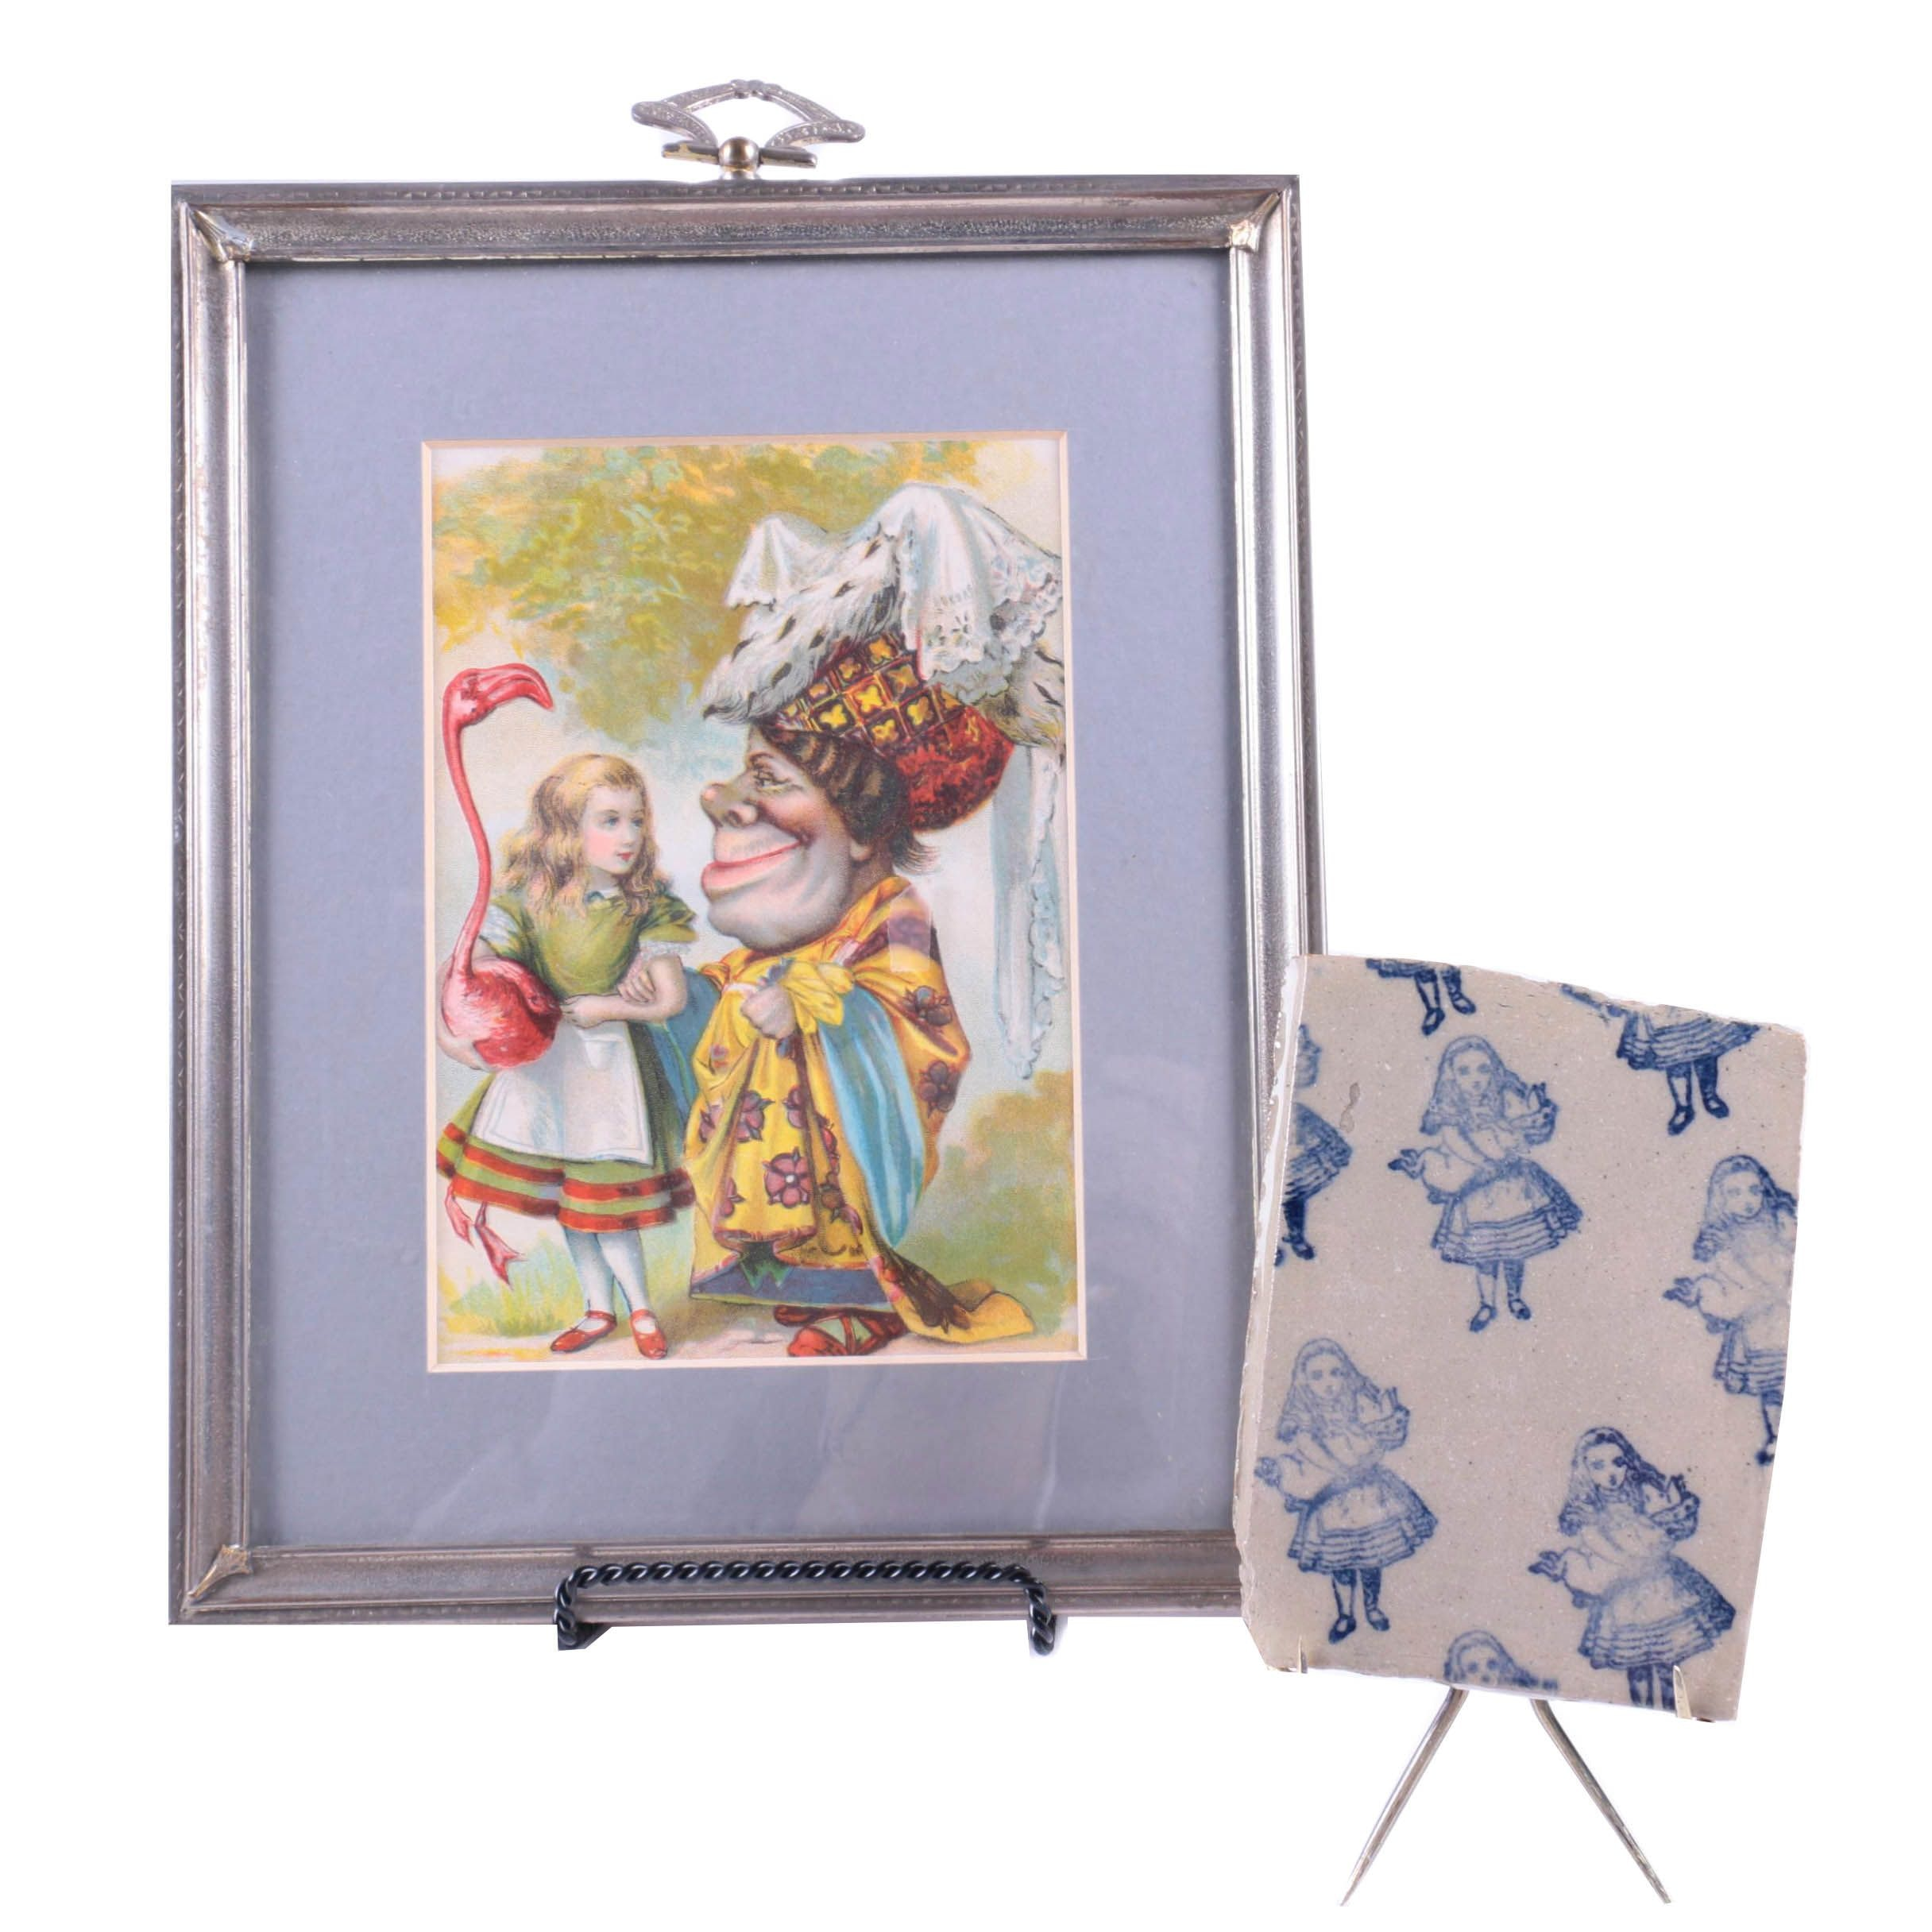 Alice in Wonderland Print and Decorative Items